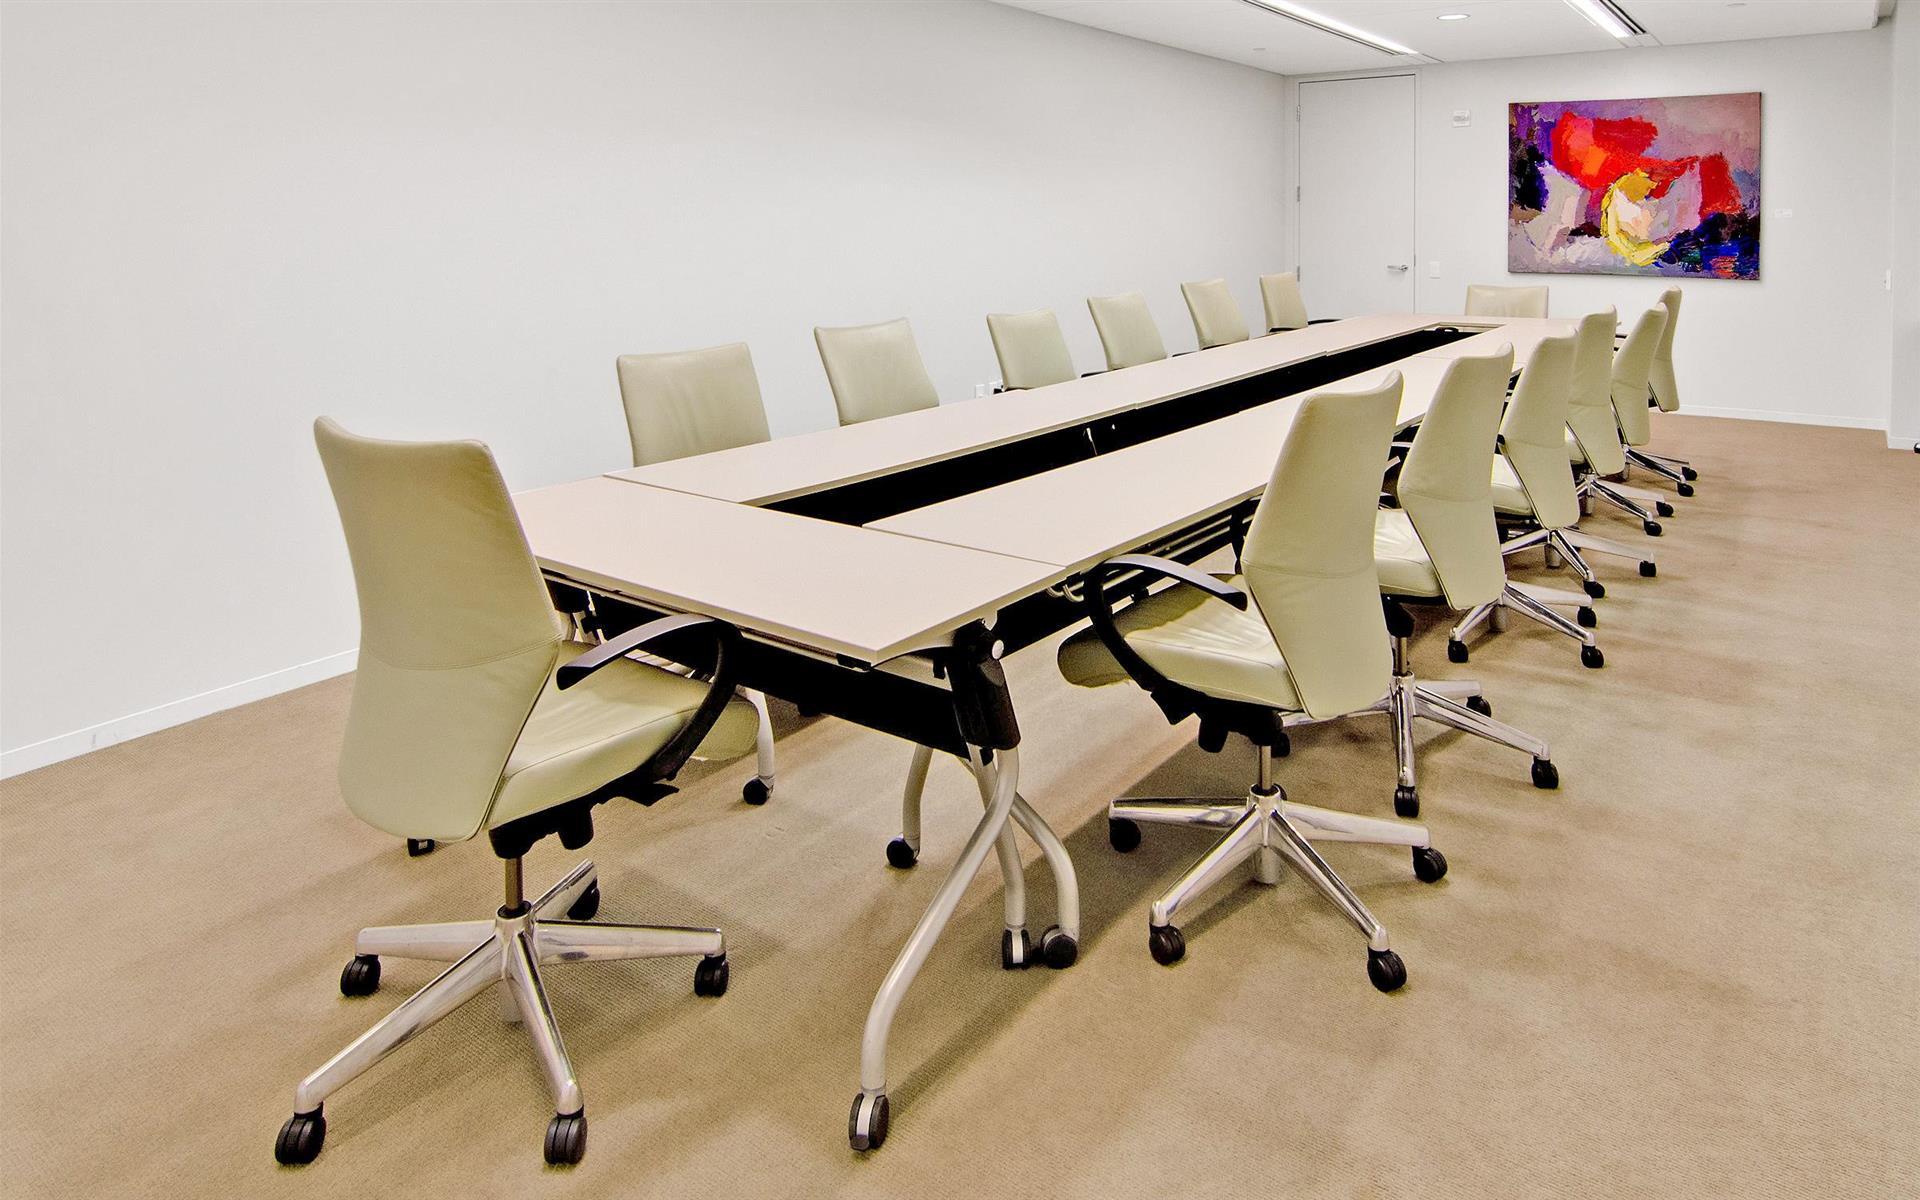 AdvantEdge BC - Downtown Center - Conference Room #3, Suite 800